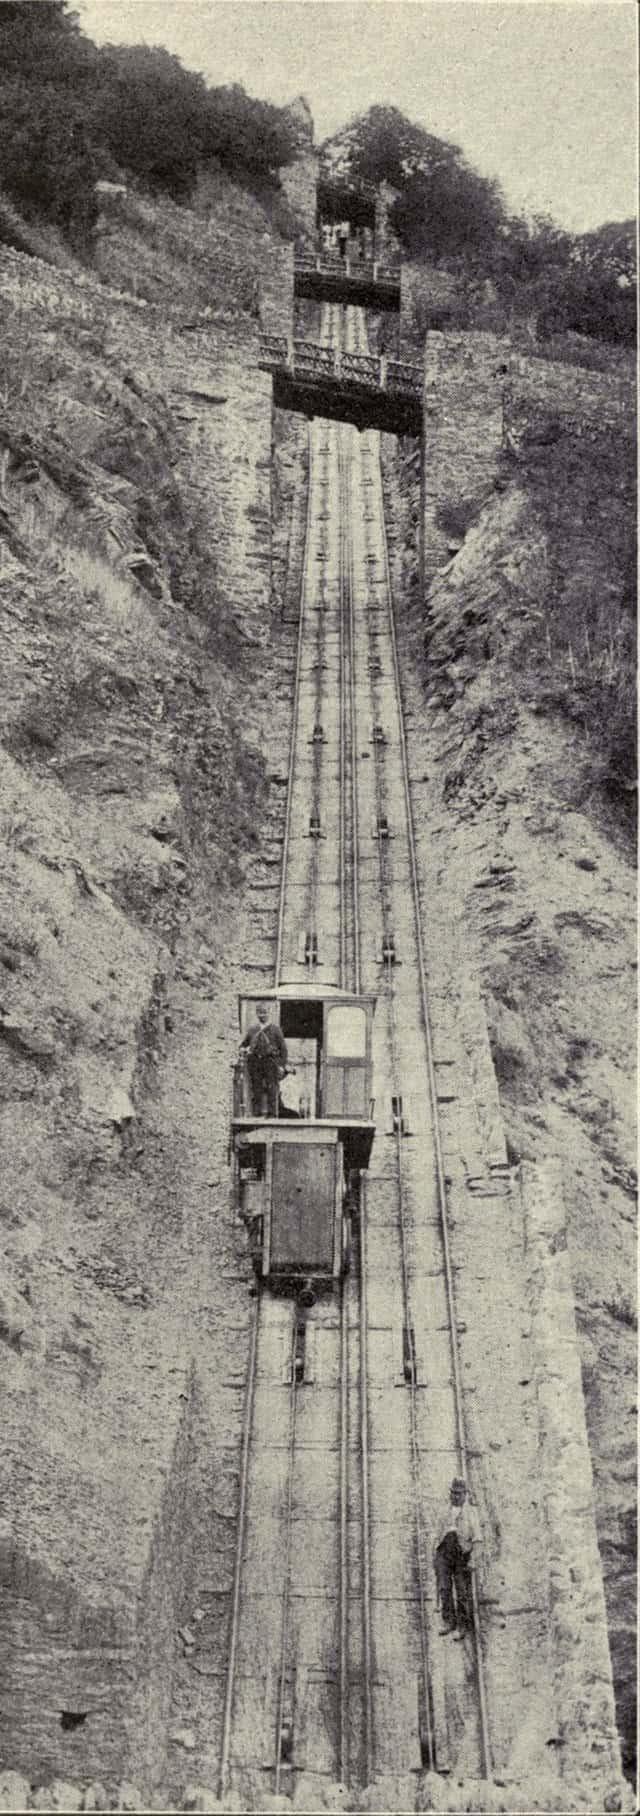 640px Lynton Cliff Railway